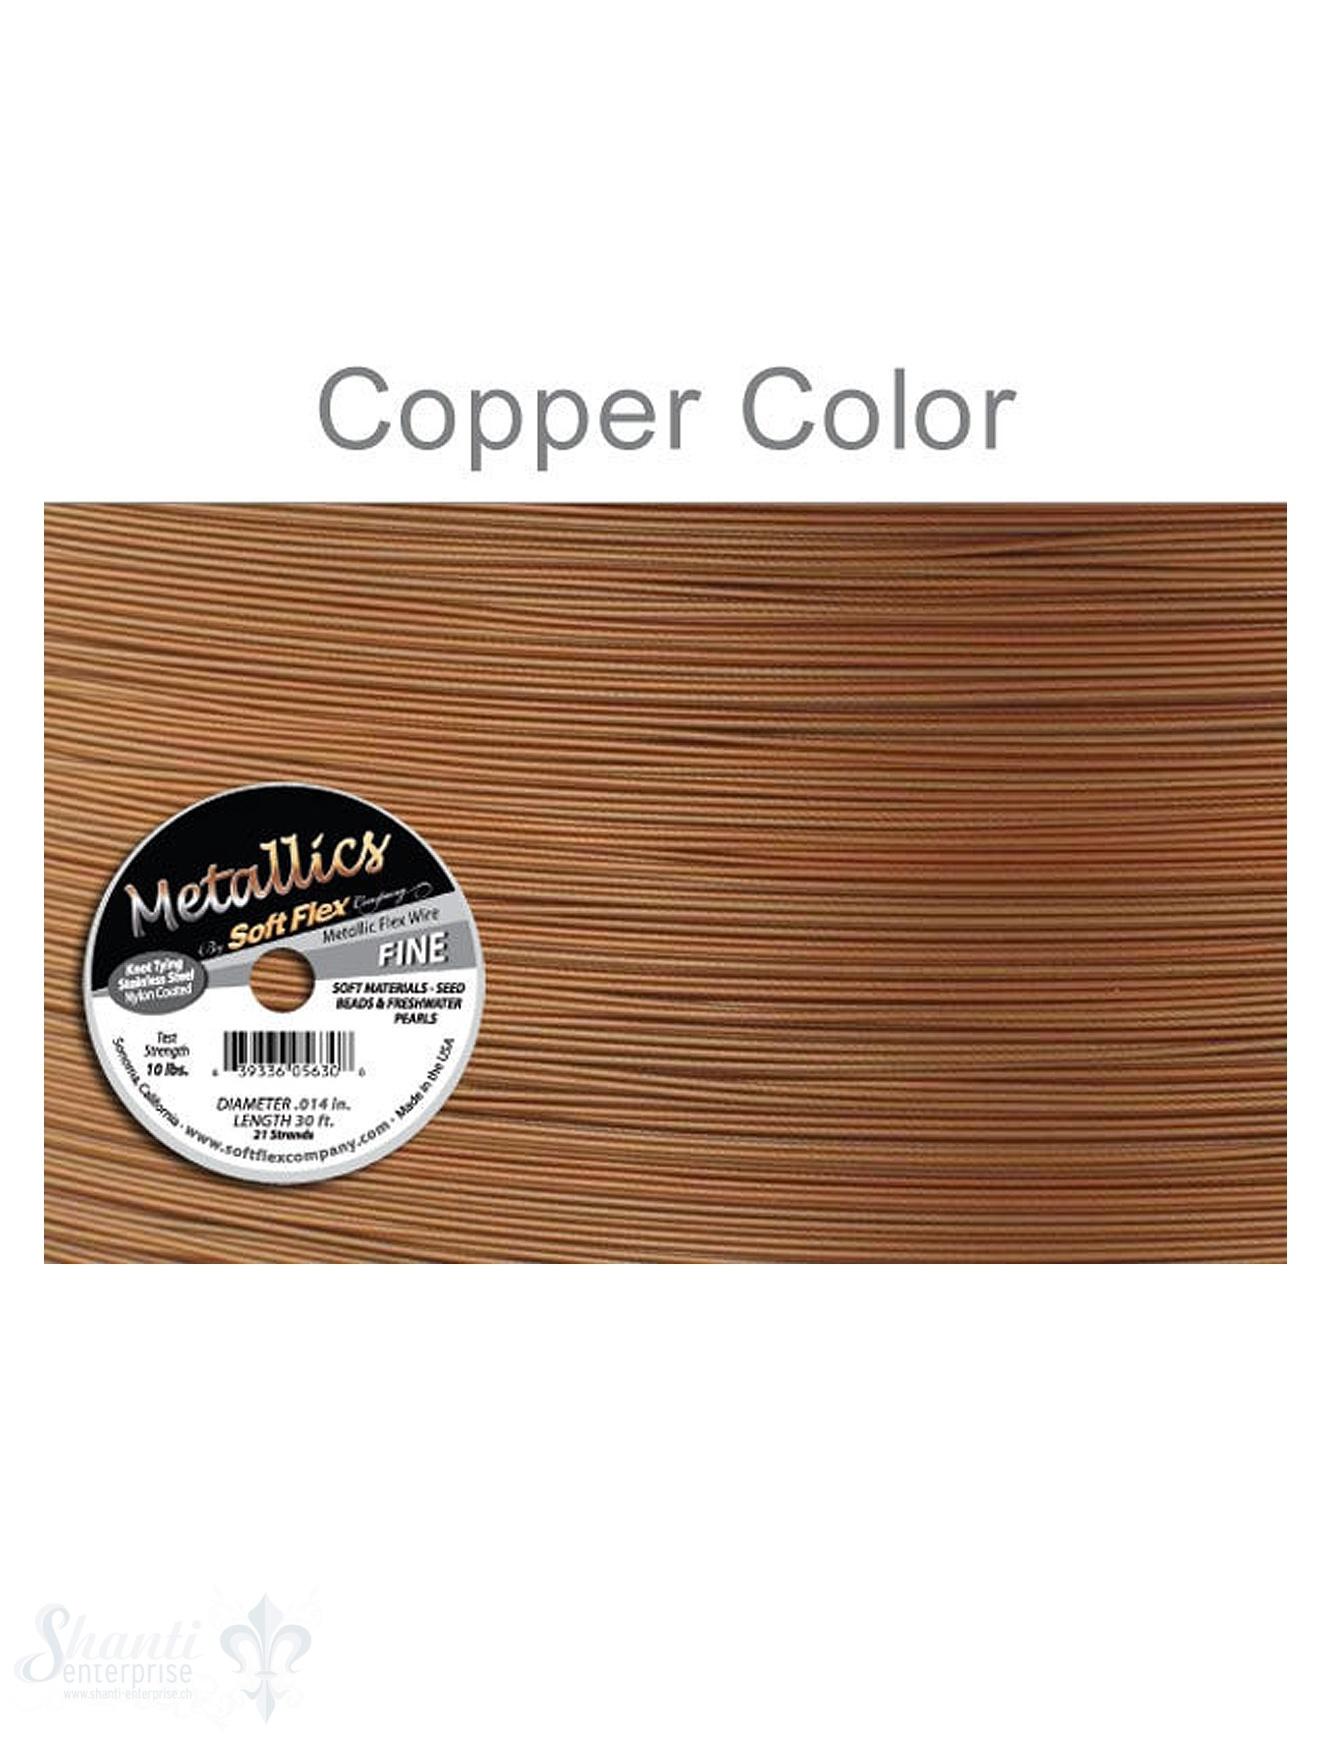 Soft Flex Soft Flex Metallic Flex Wire Copper Draht